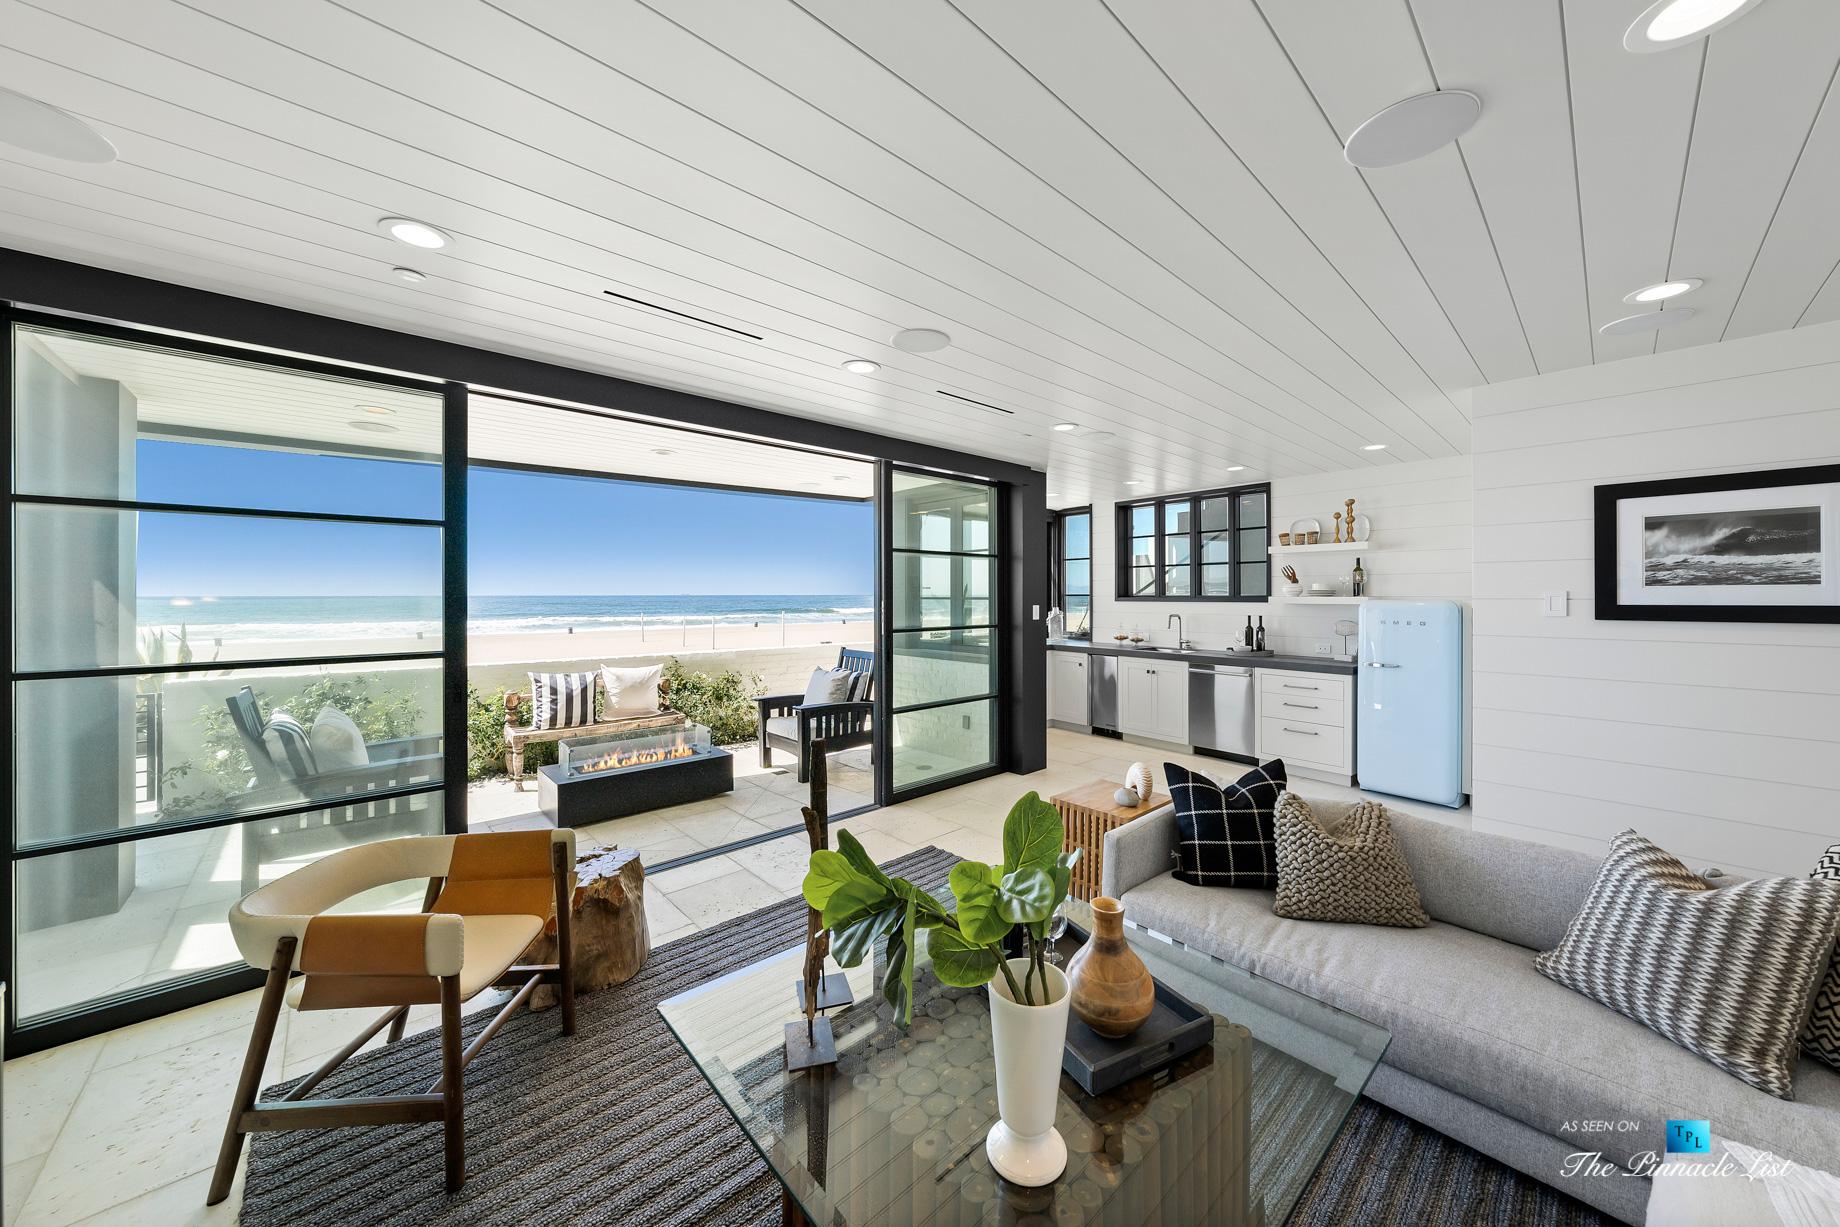 508 The Strand, Manhattan Beach, CA, USA - Lower Level Living Room Beachfront Patio - Luxury Real Estate - Oceanfront Home